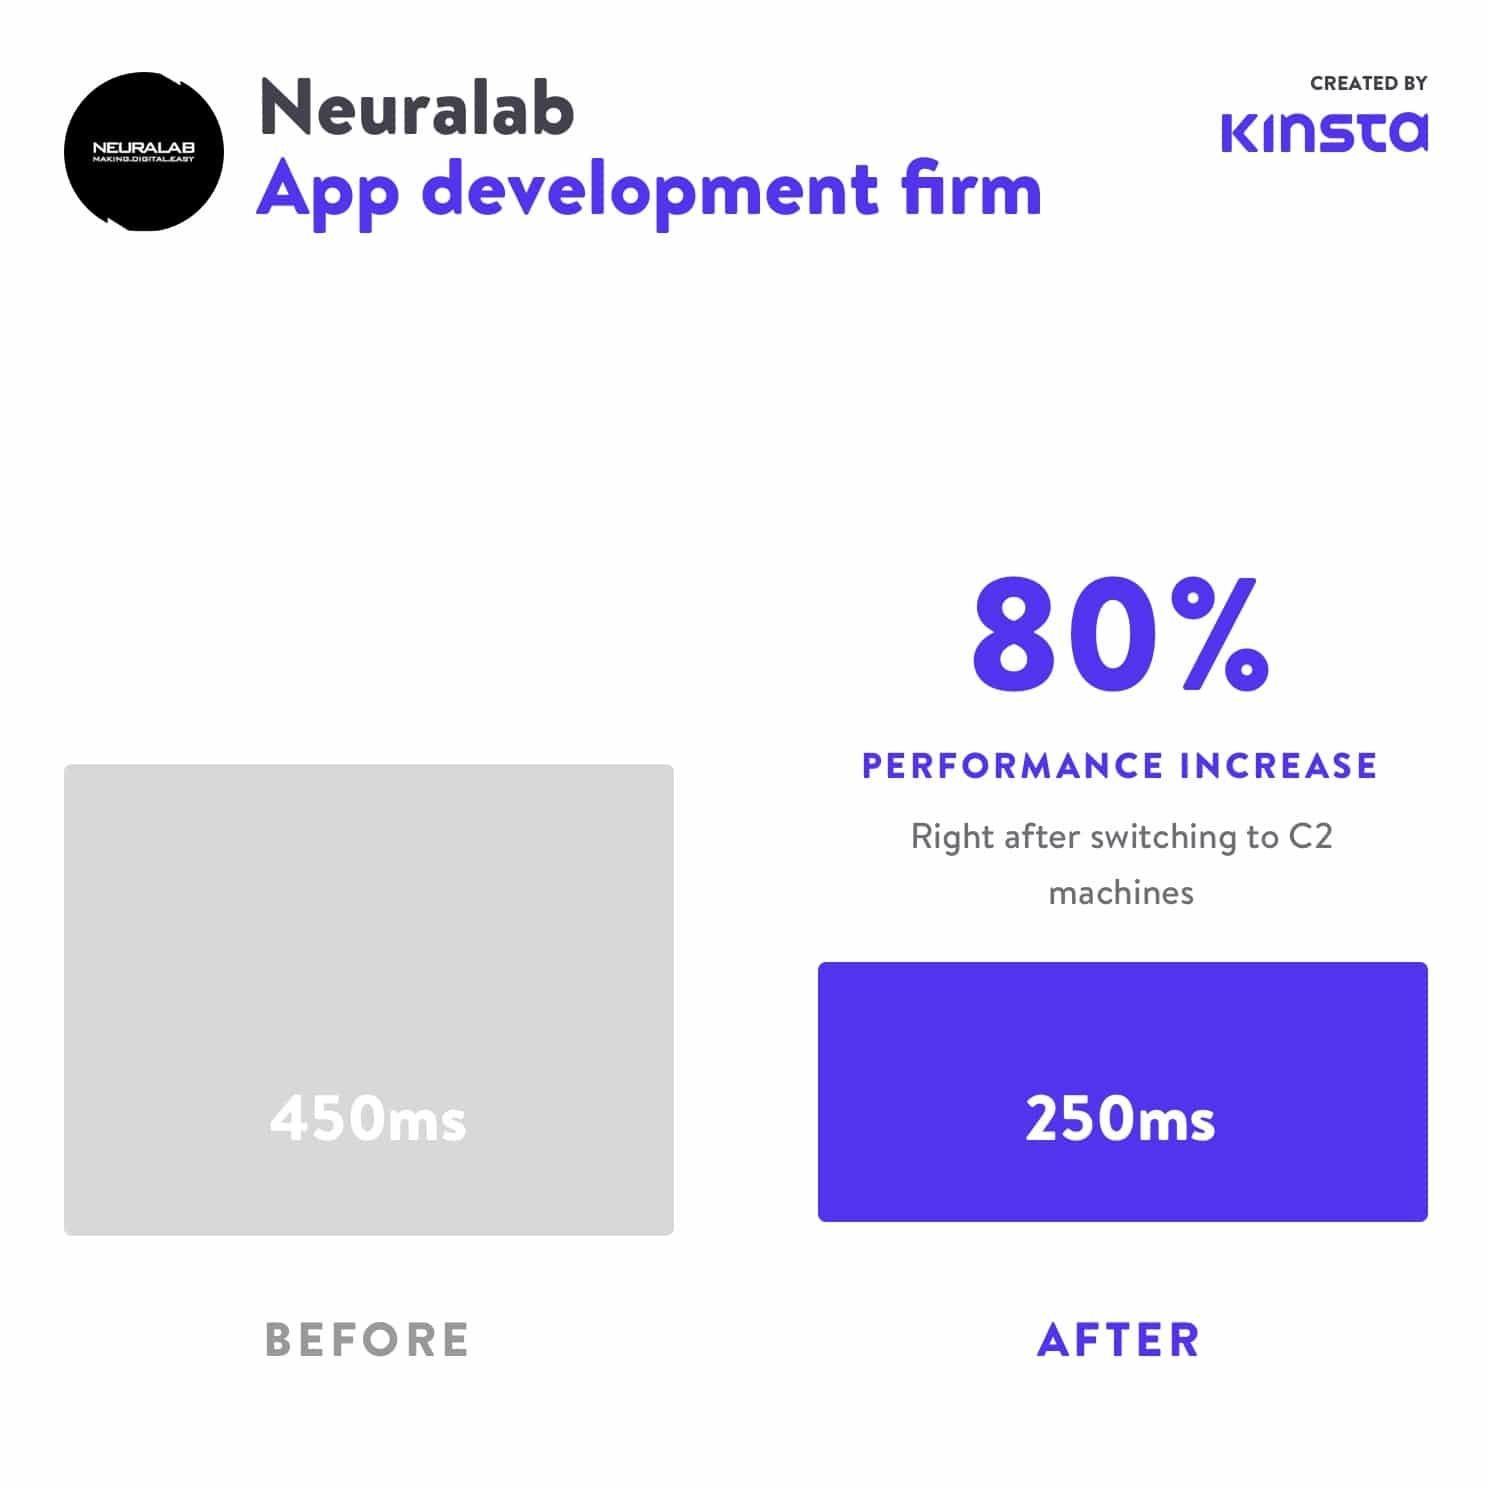 NeuralabがC2に切り替えた後、パフォーマンスが80%向上